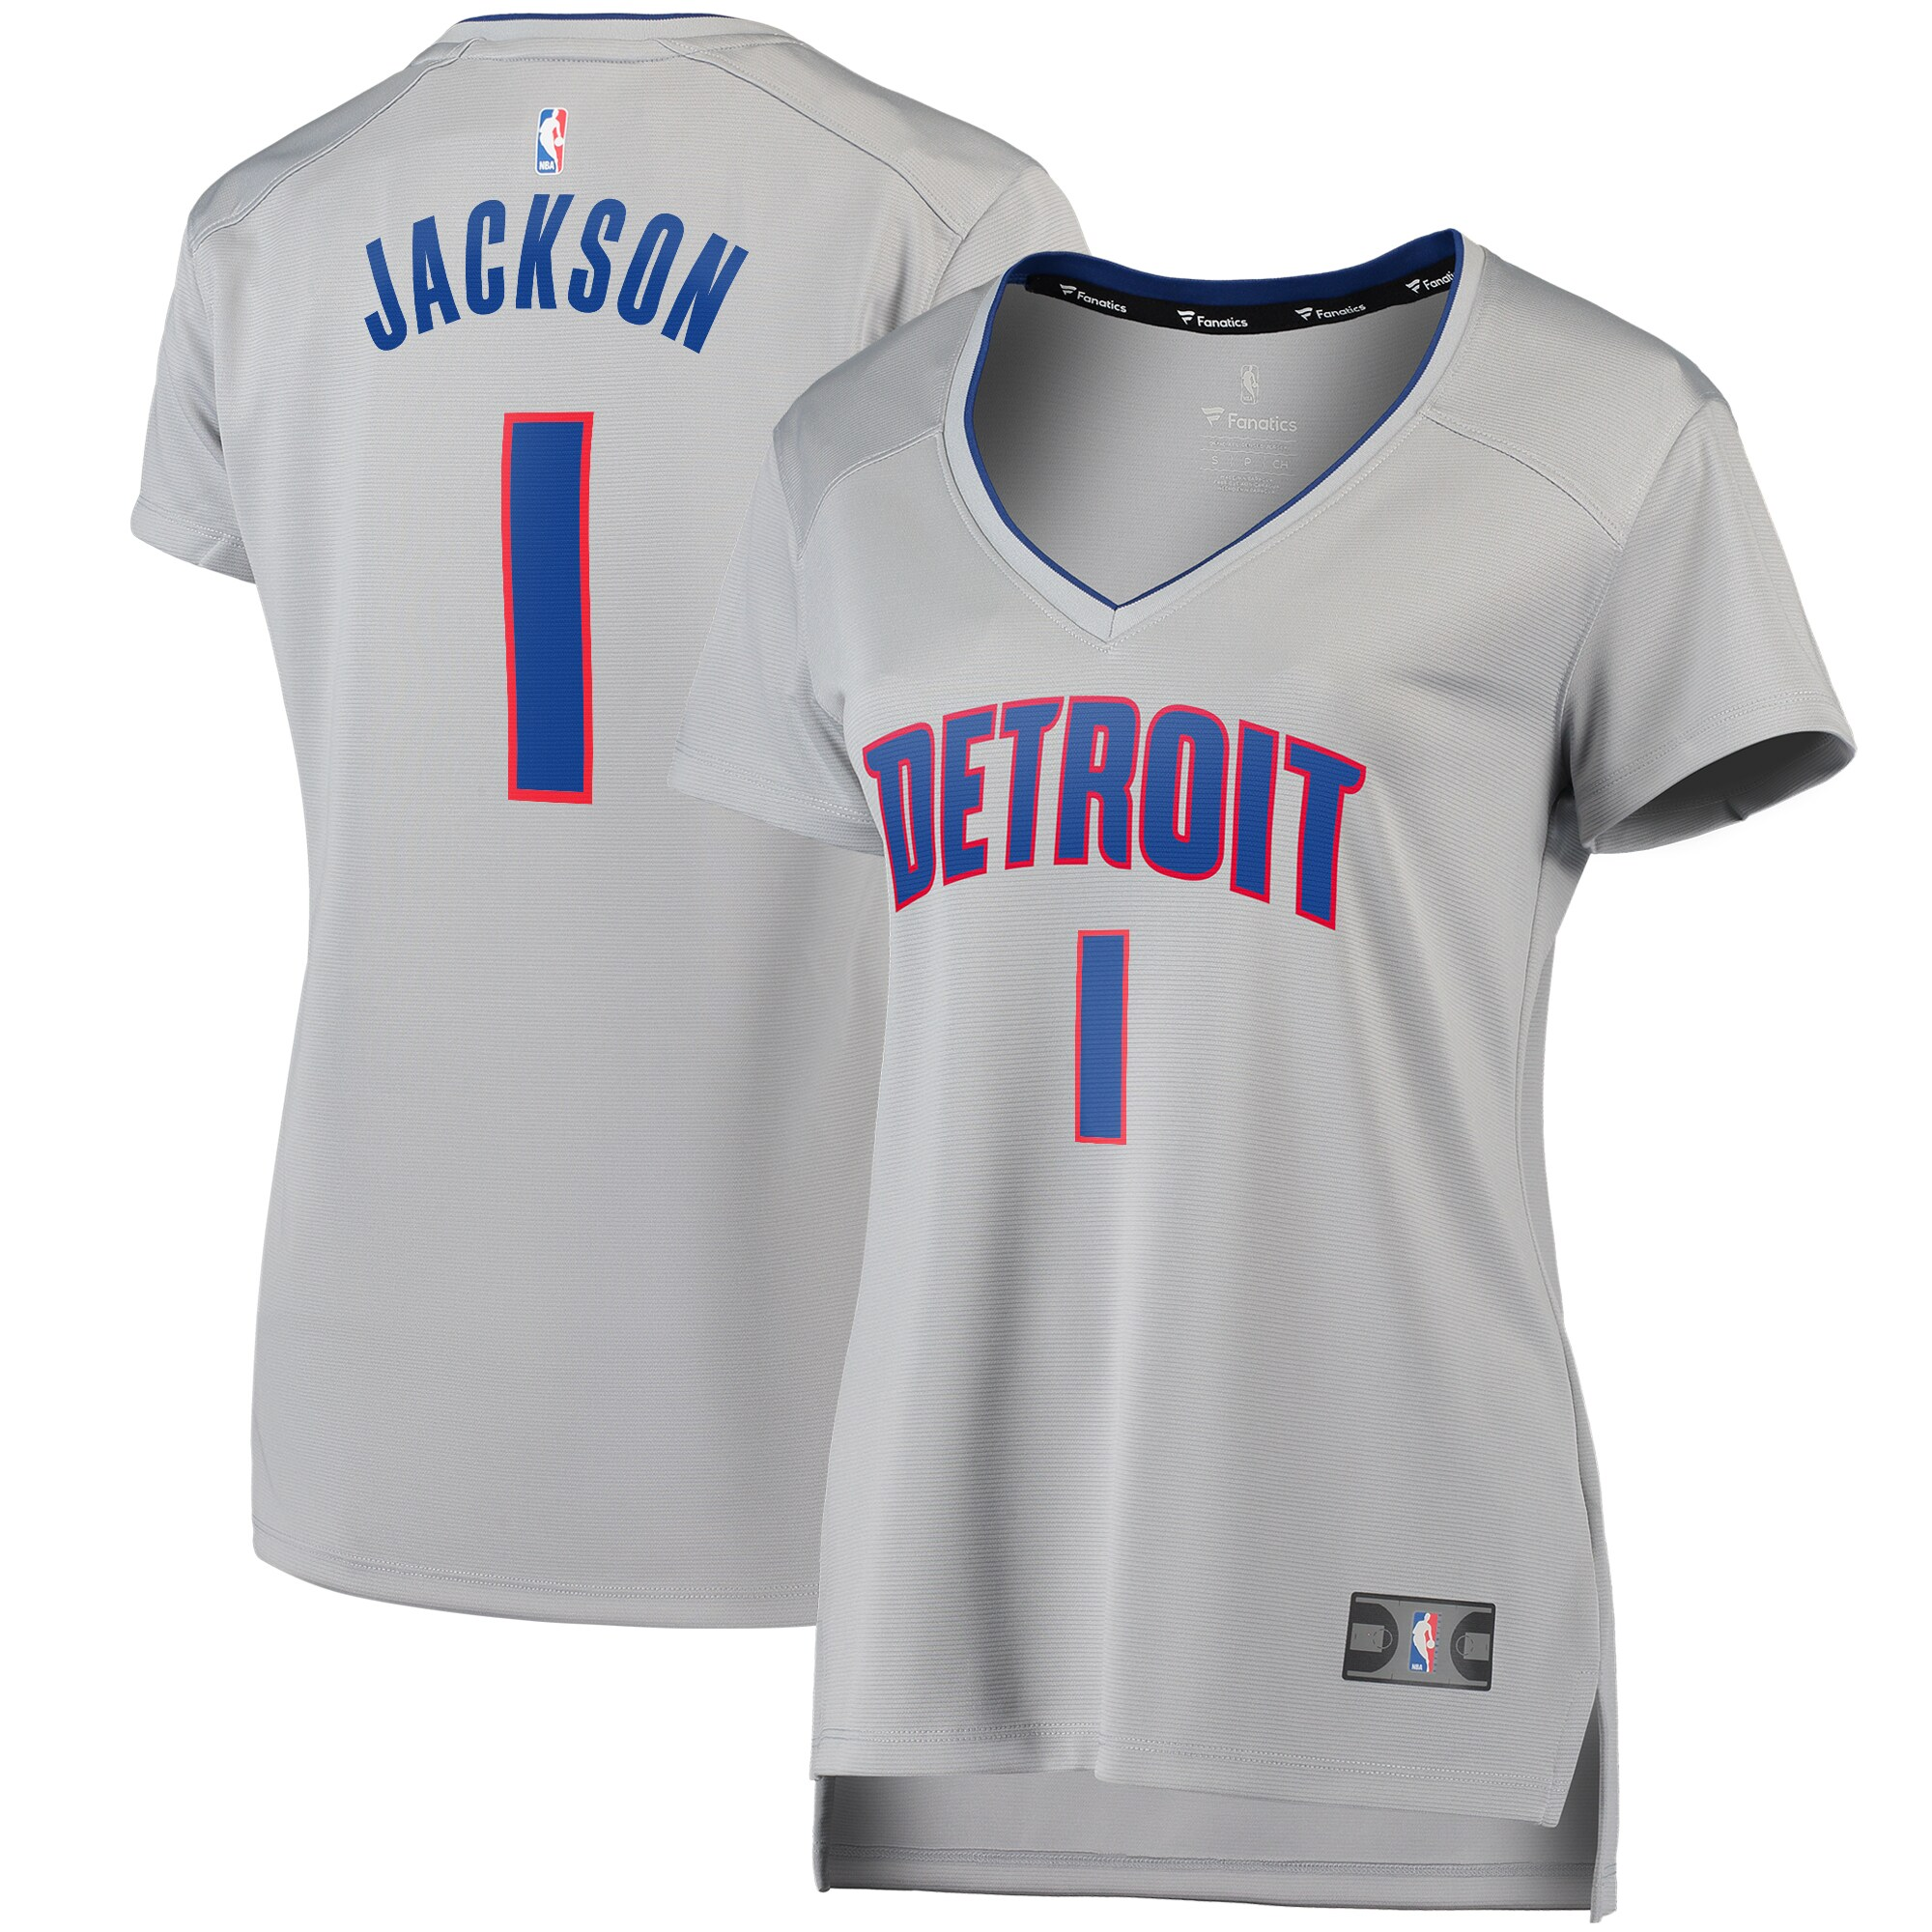 Reggie Jackson Detroit Pistons Fanatics Branded Women's Fast Break Replica Player Jersey - Statement Edition - Gray